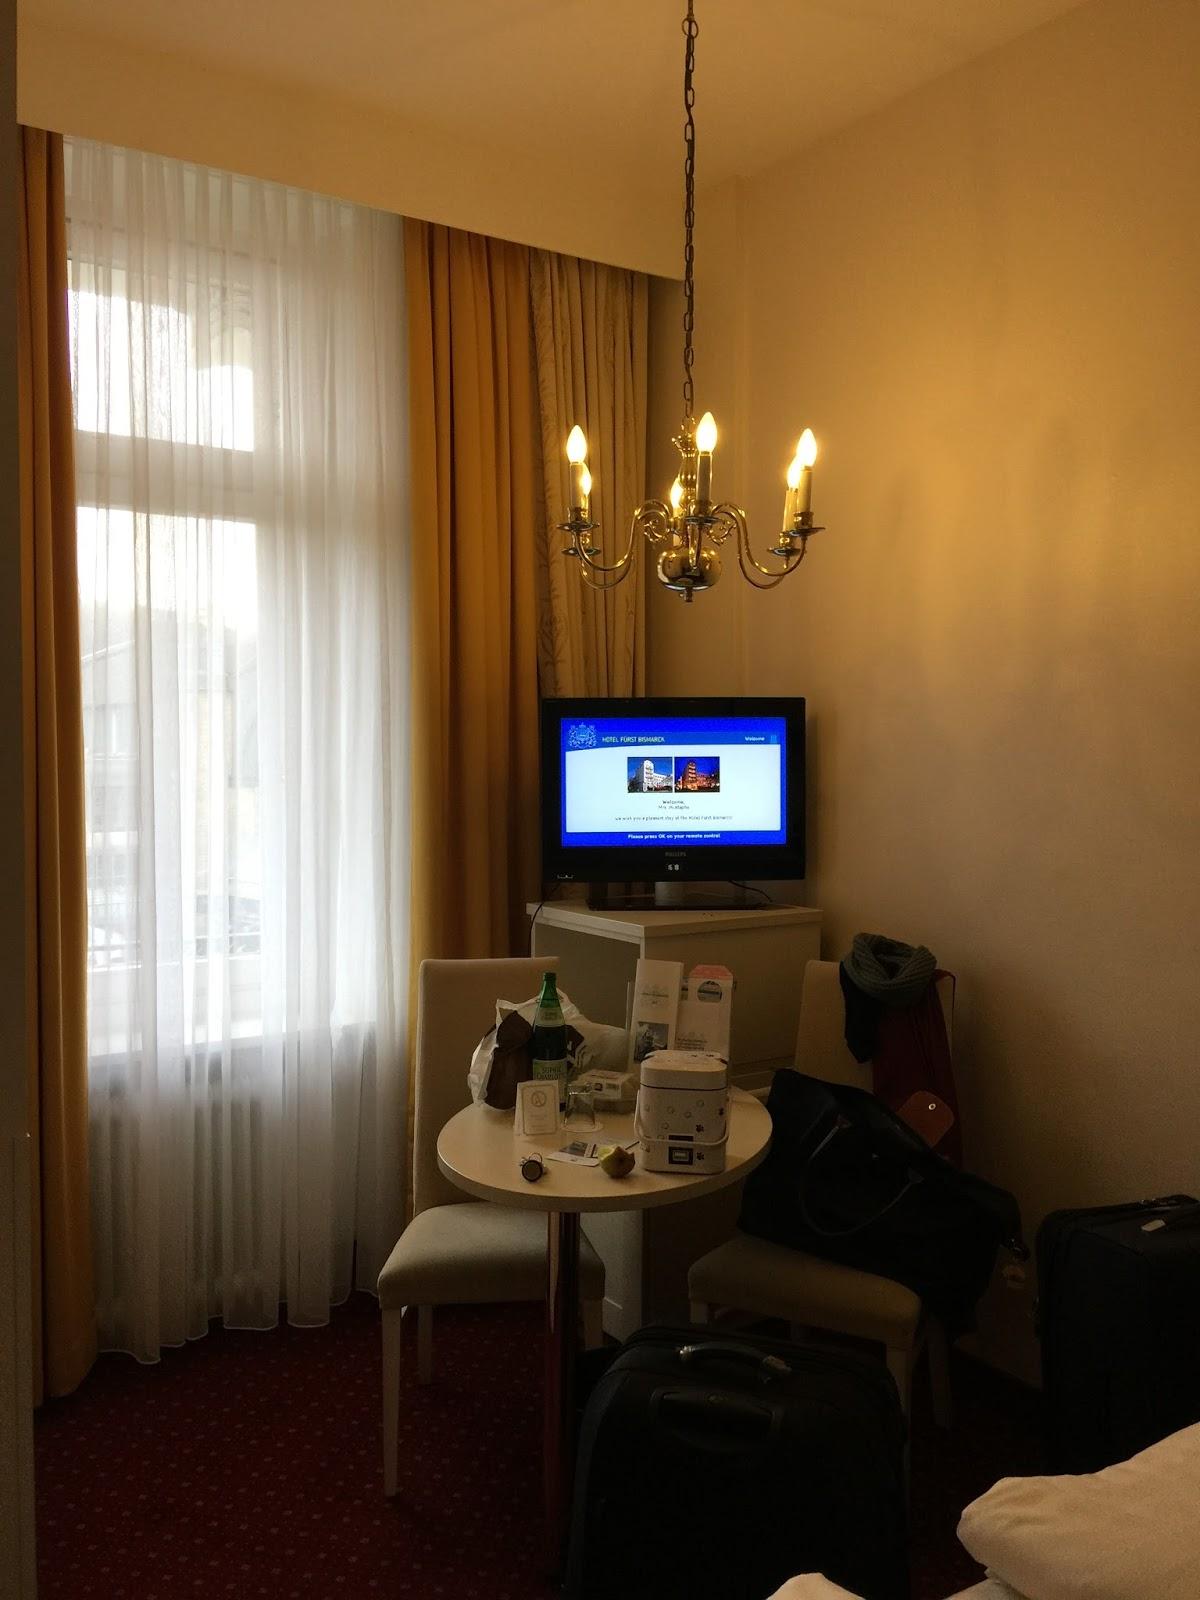 St Pauli Tour Hotel